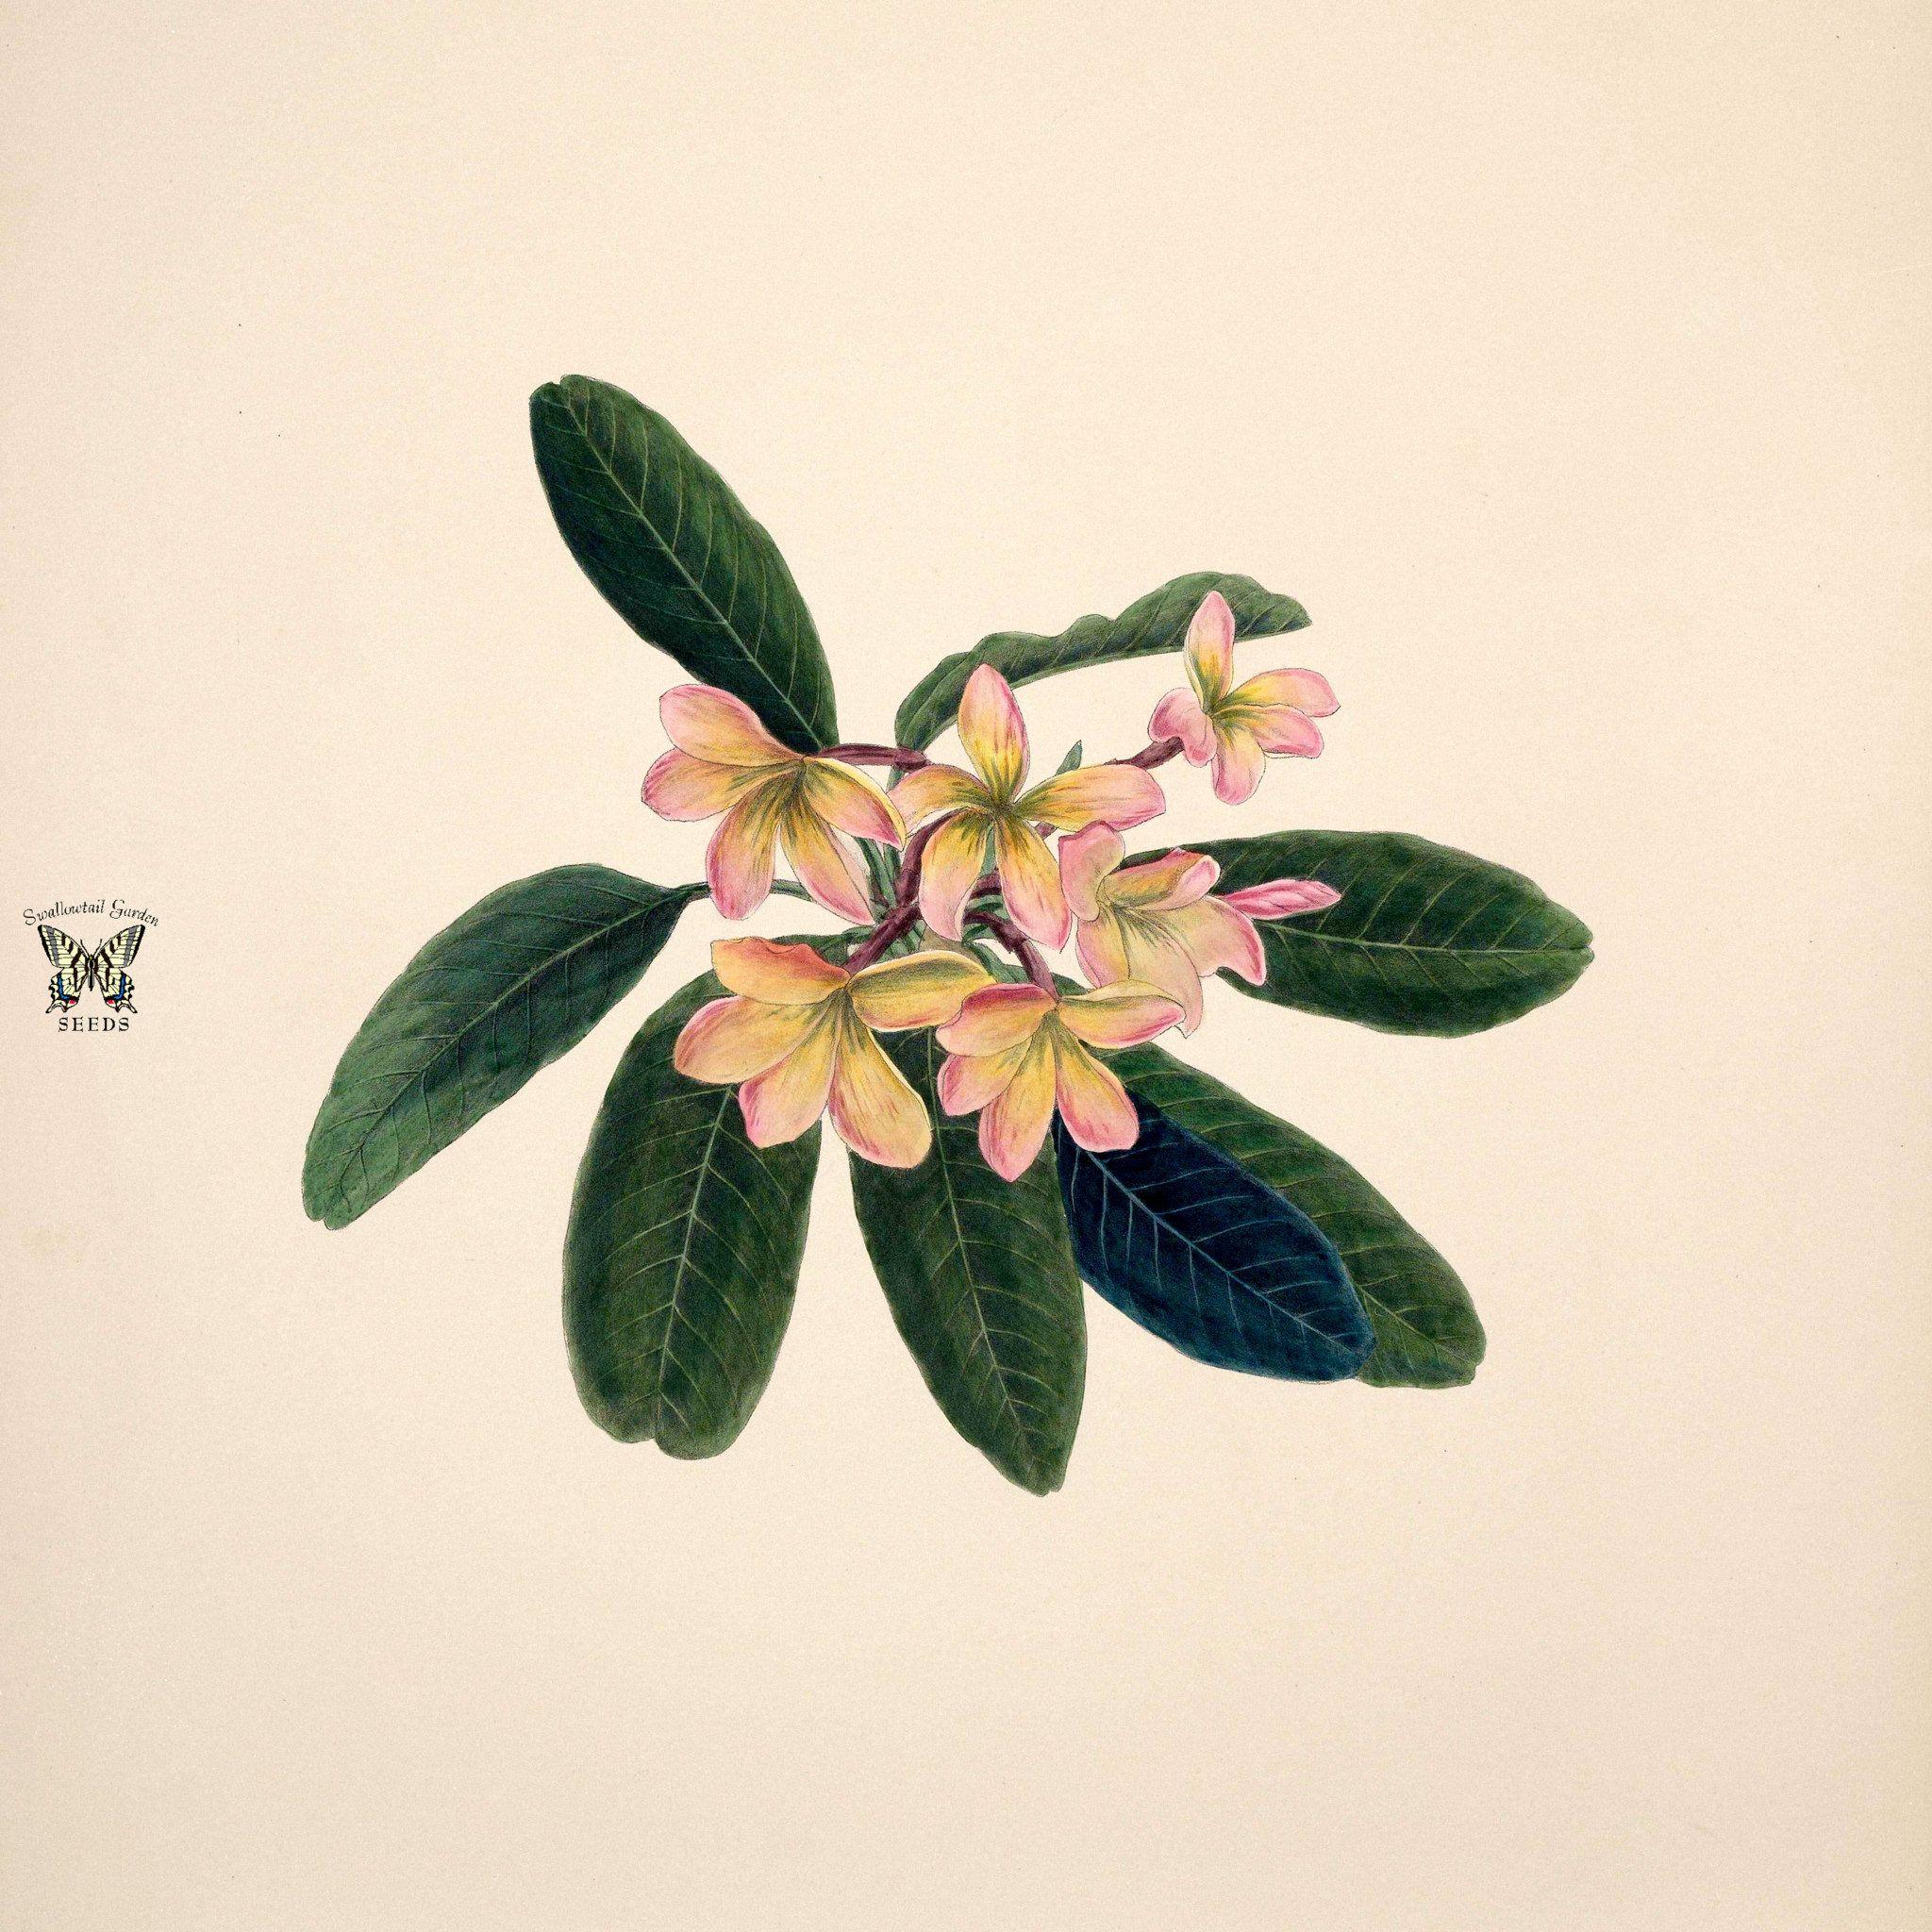 Frangipani West Indian Jasmine Plumeria Rubra Indian Flowers Jasmine Drawing Flower Illustration